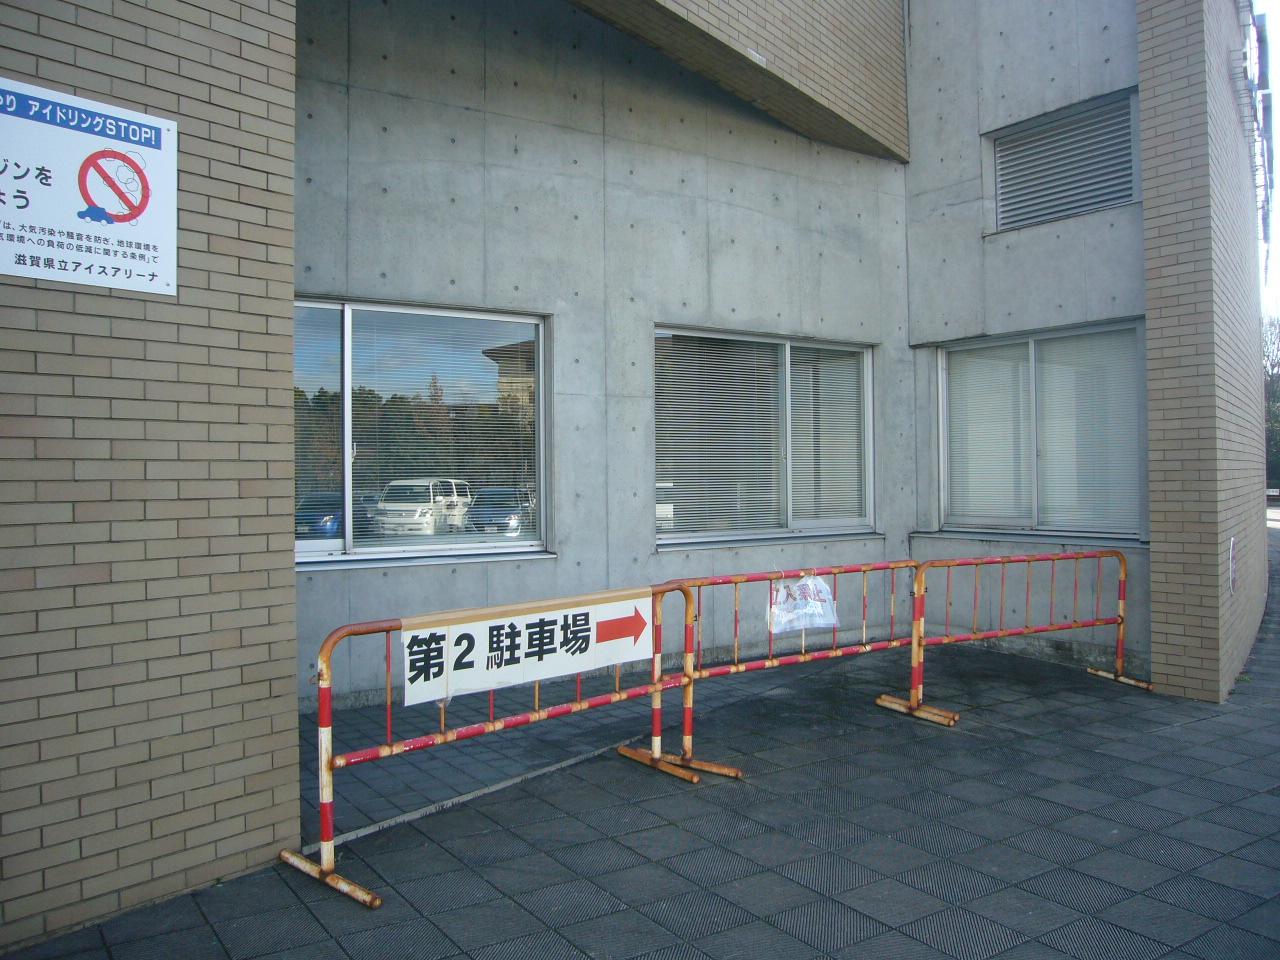 p1140025.JPG